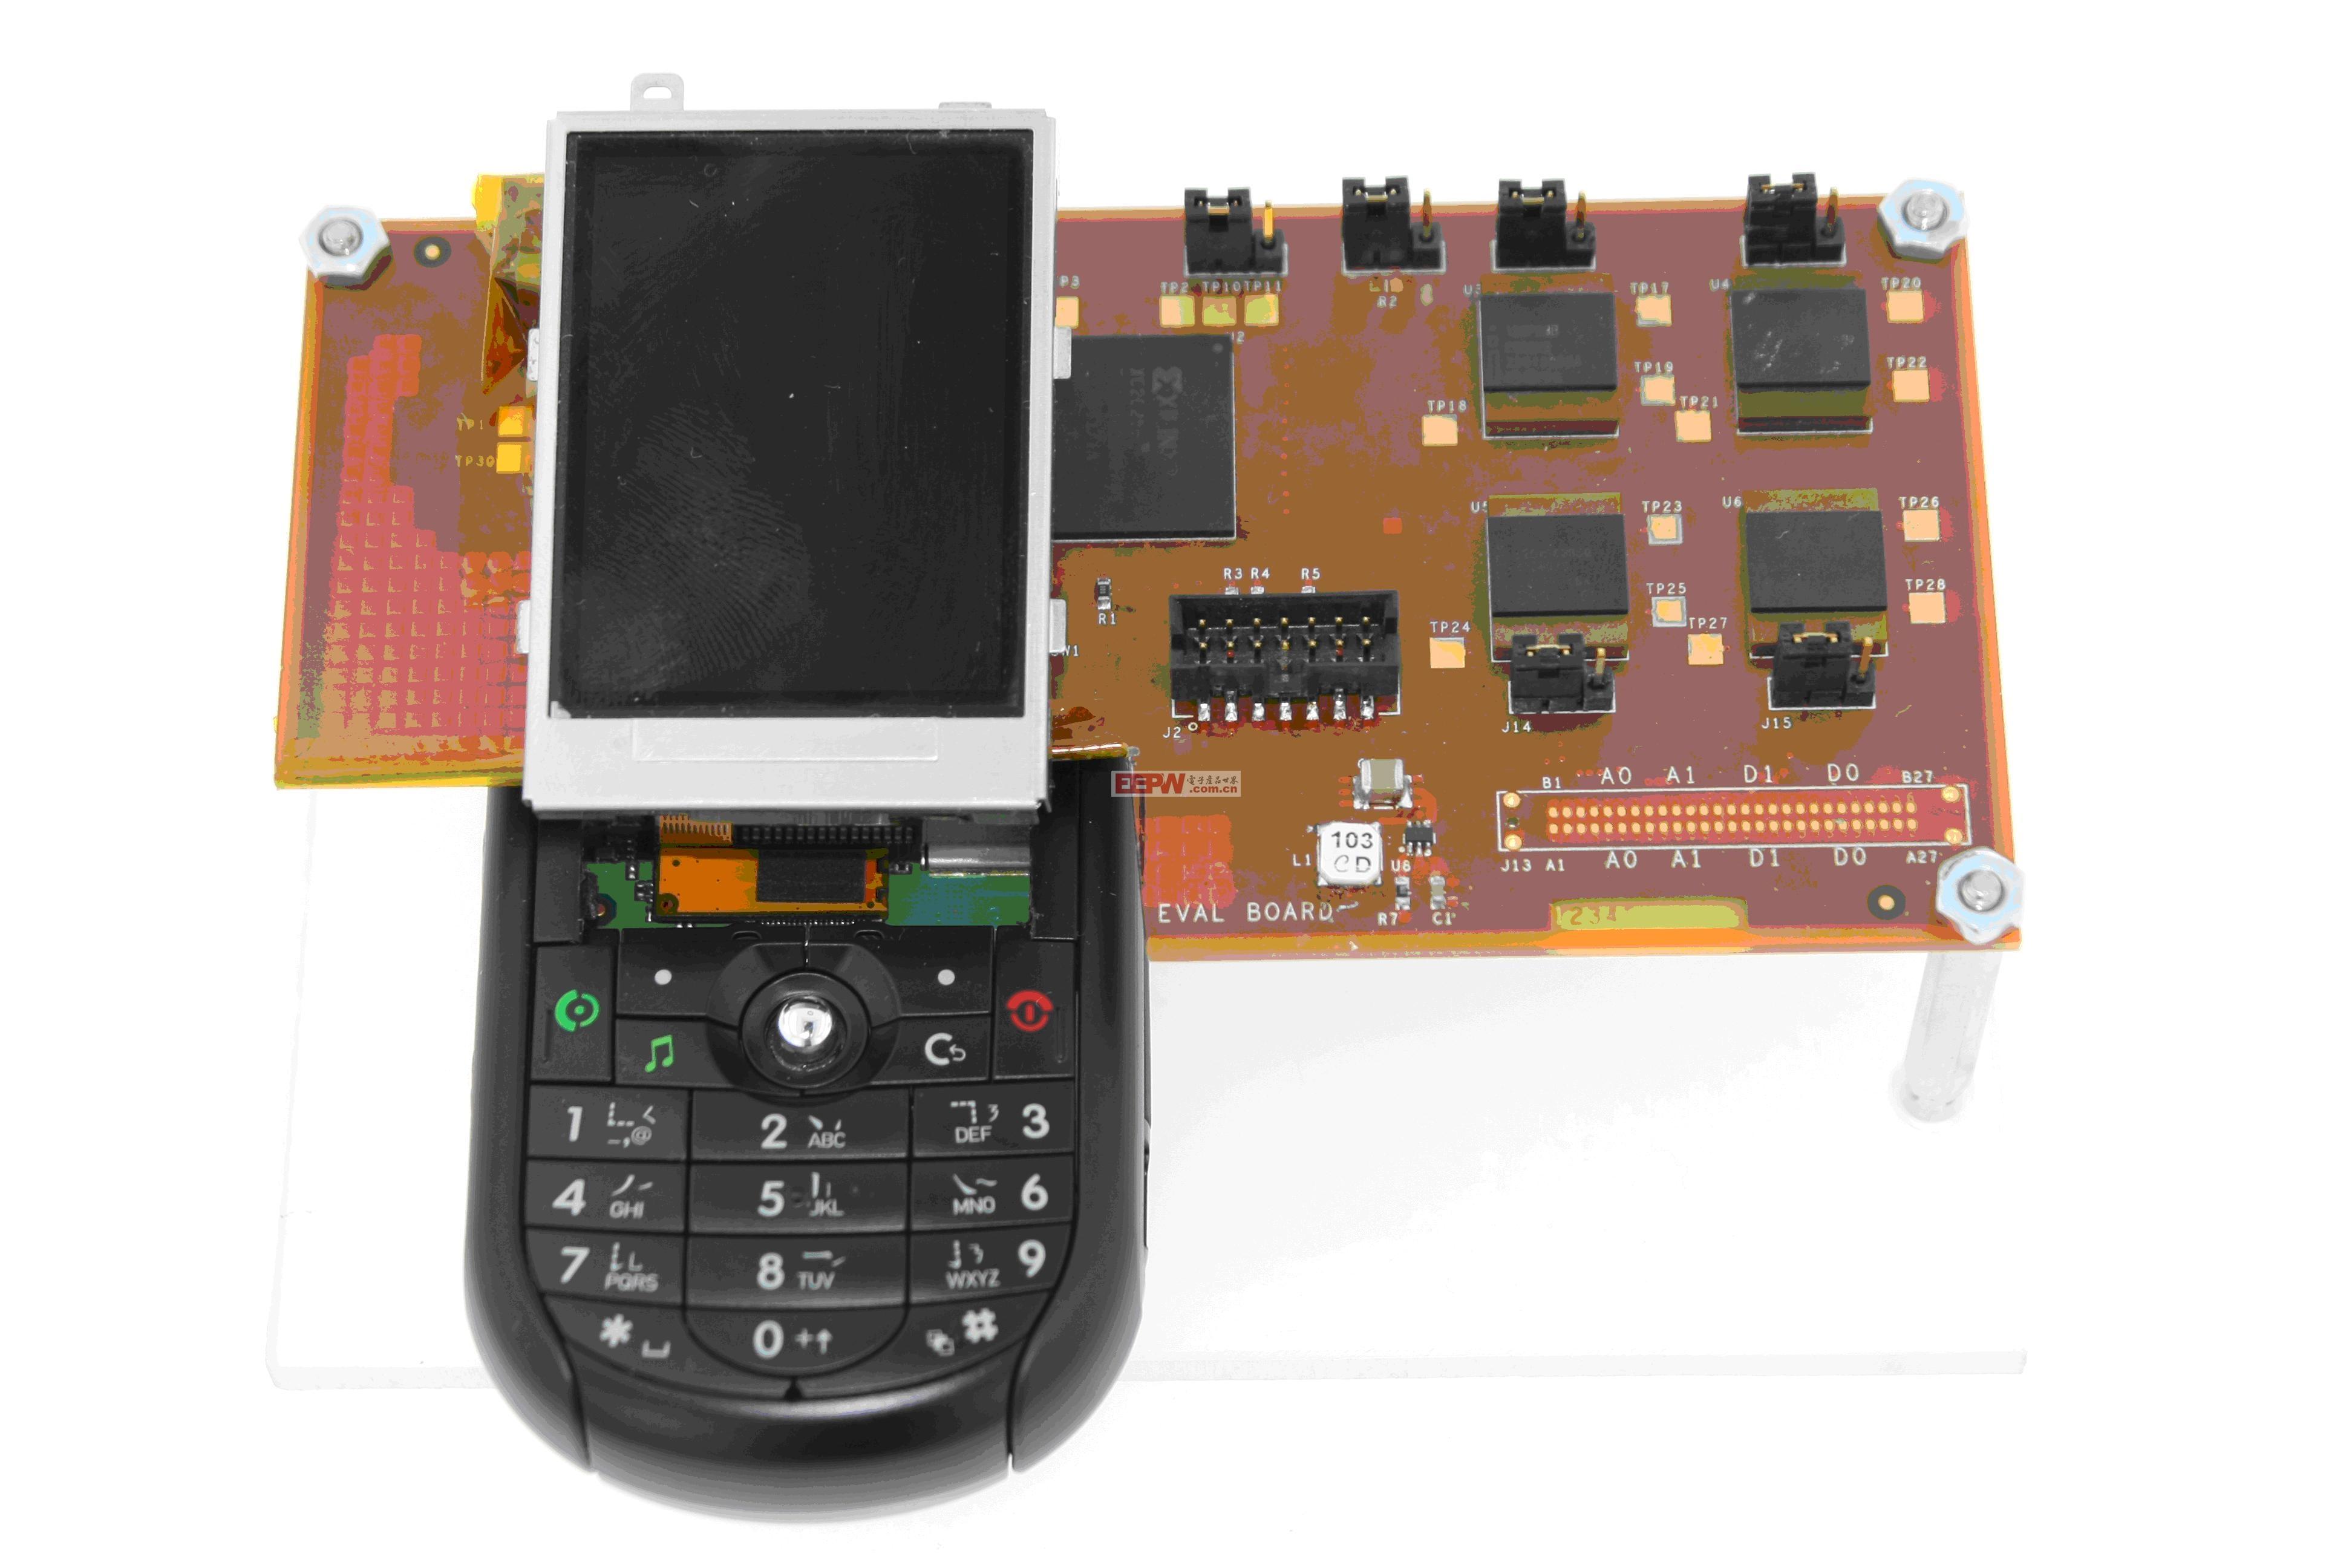 PCM可提高先进嵌入式系统的性能,这已在高端无线通信系统中 得到证实